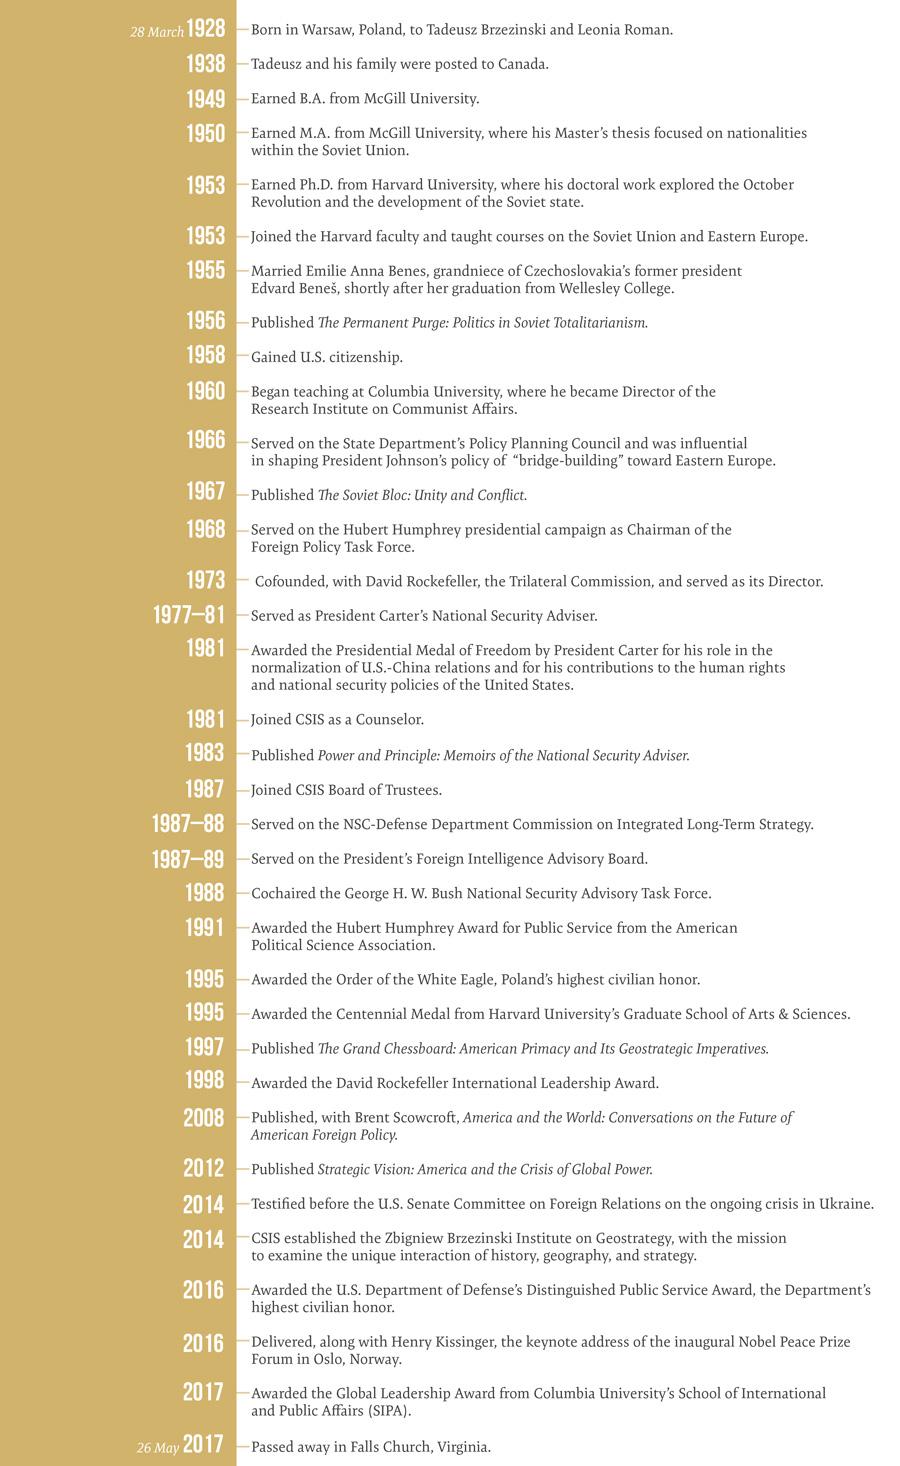 A Timeline of Zbig